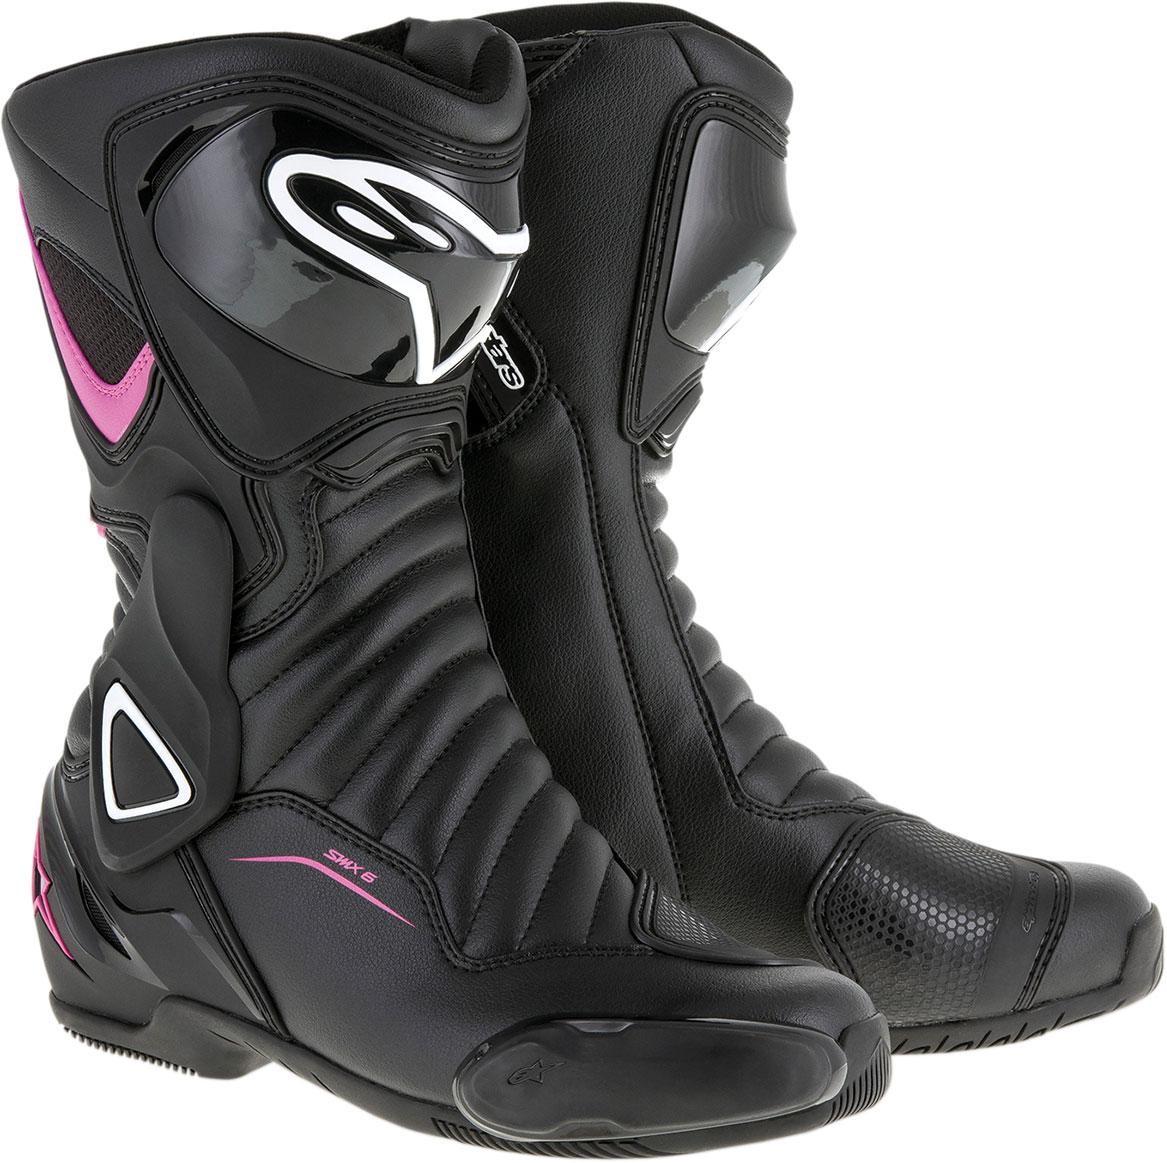 Alpinestars Stella SMX-6 V2 Vented Road/Track Motorcycle Boots (Black/Pink/White)